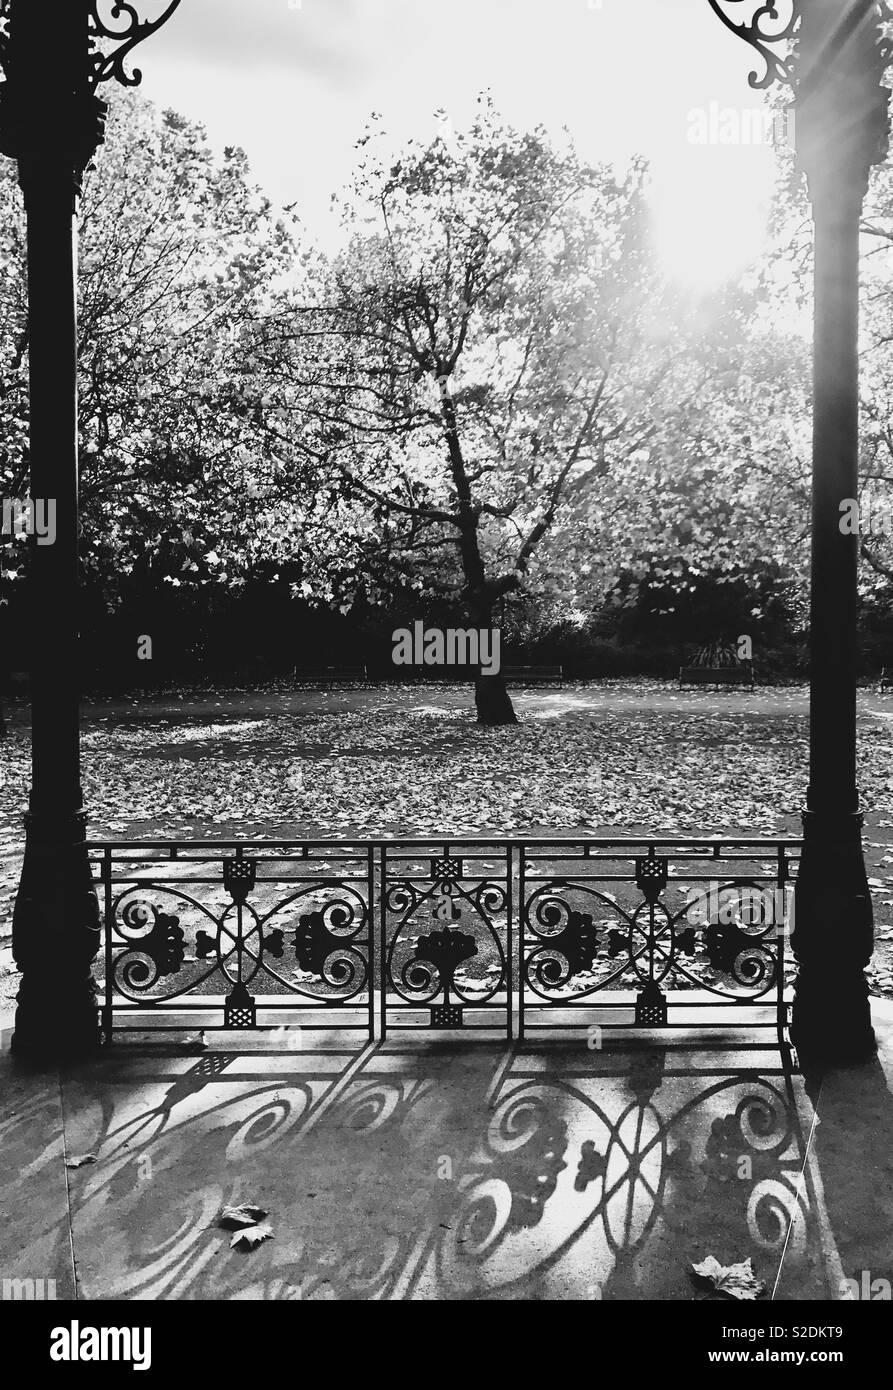 Bandstand Battersea Park, London - Stock Image